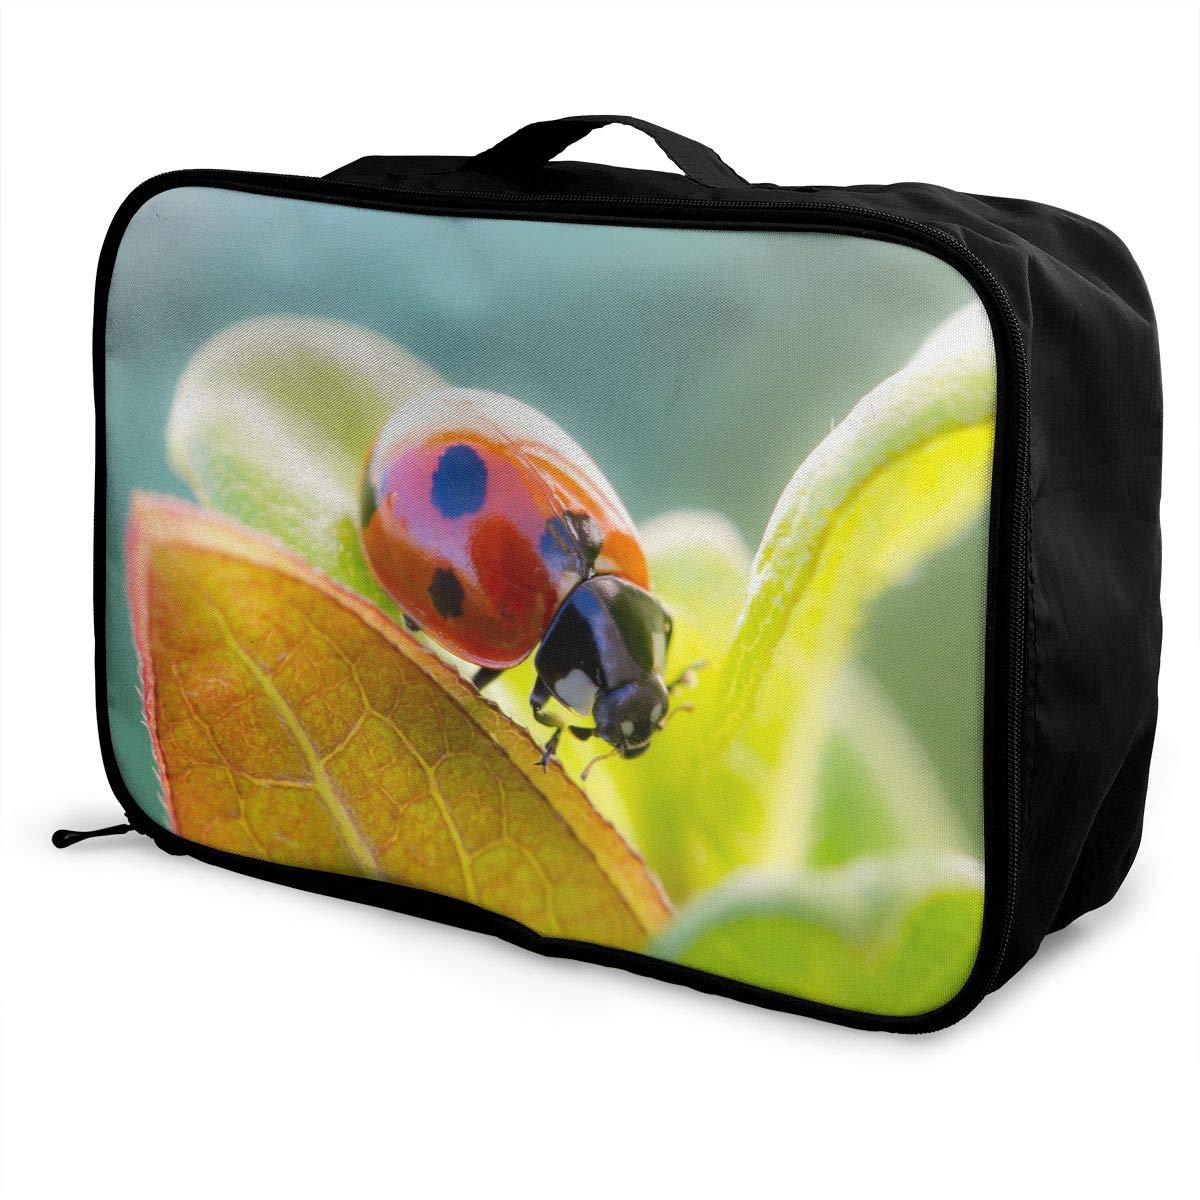 Travel Luggage Duffle Bag Lightweight Portable Handbag Coccinella Septempunctata Large Capacity Waterproof Foldable Storage Tote